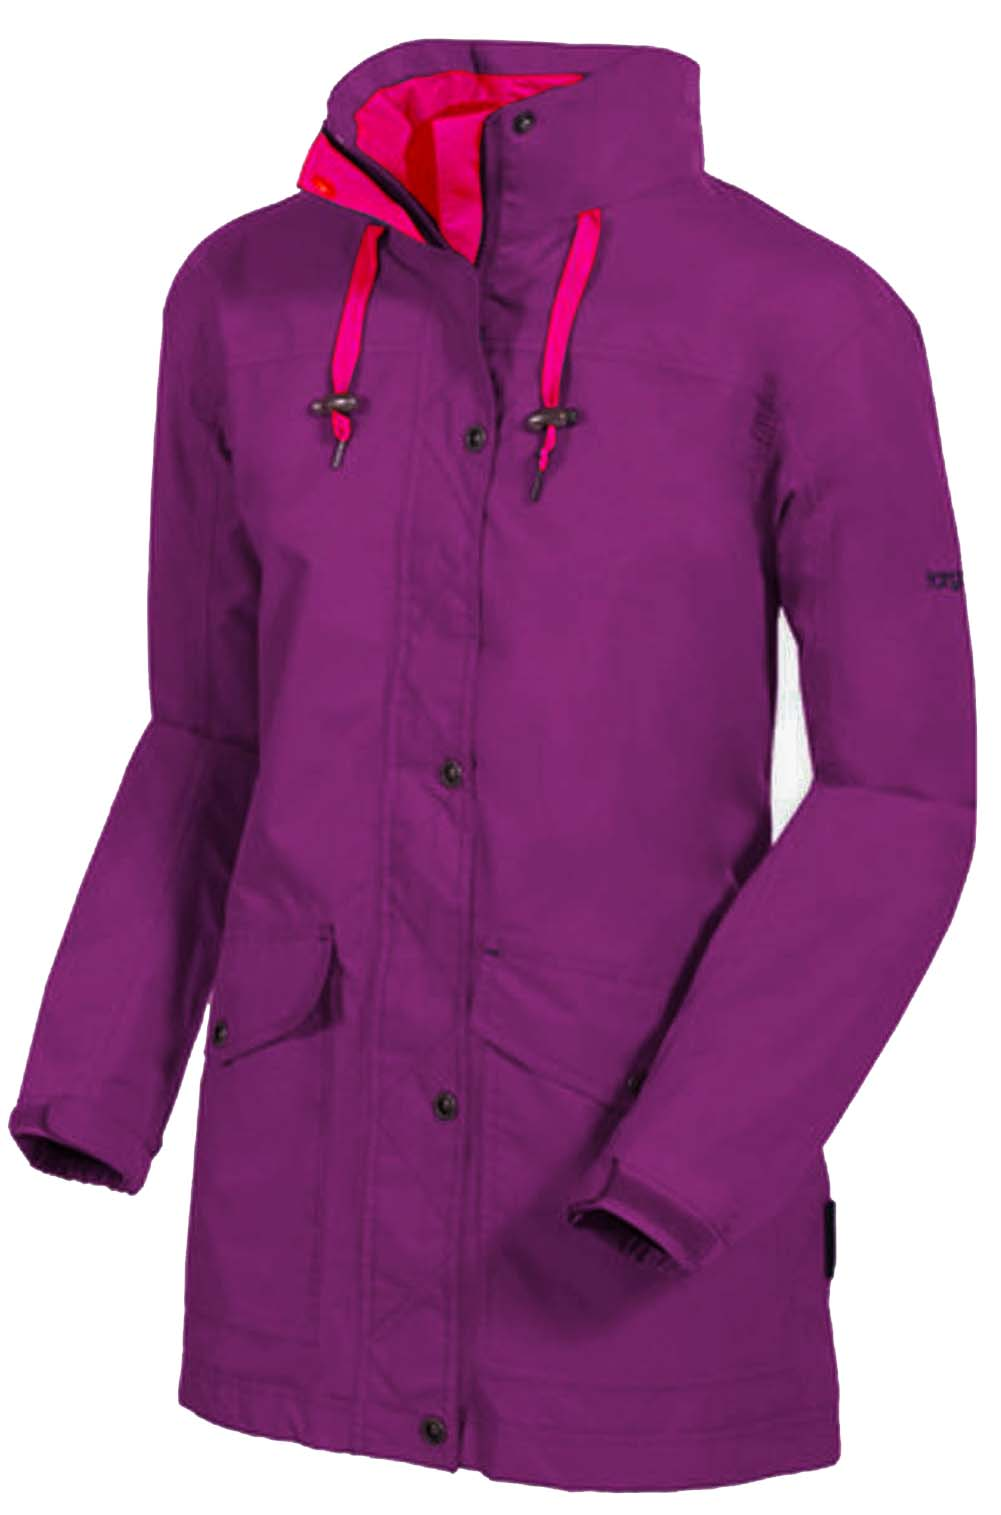 Target jackets women